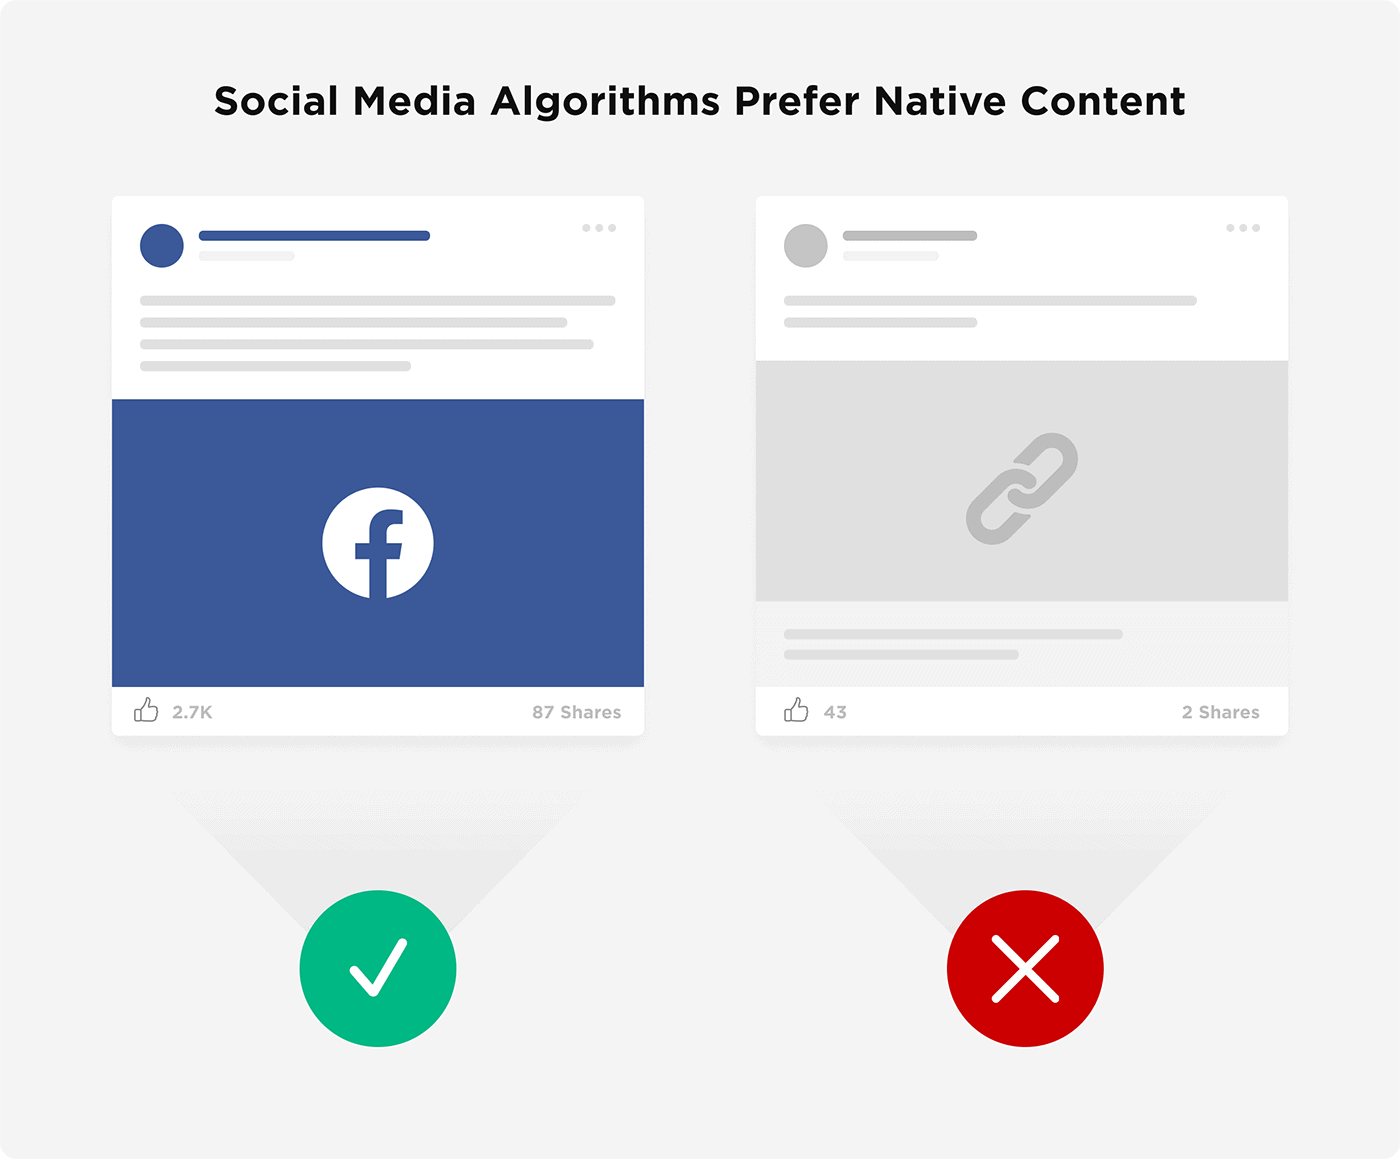 Social Media Algorithms Prefer Native Content